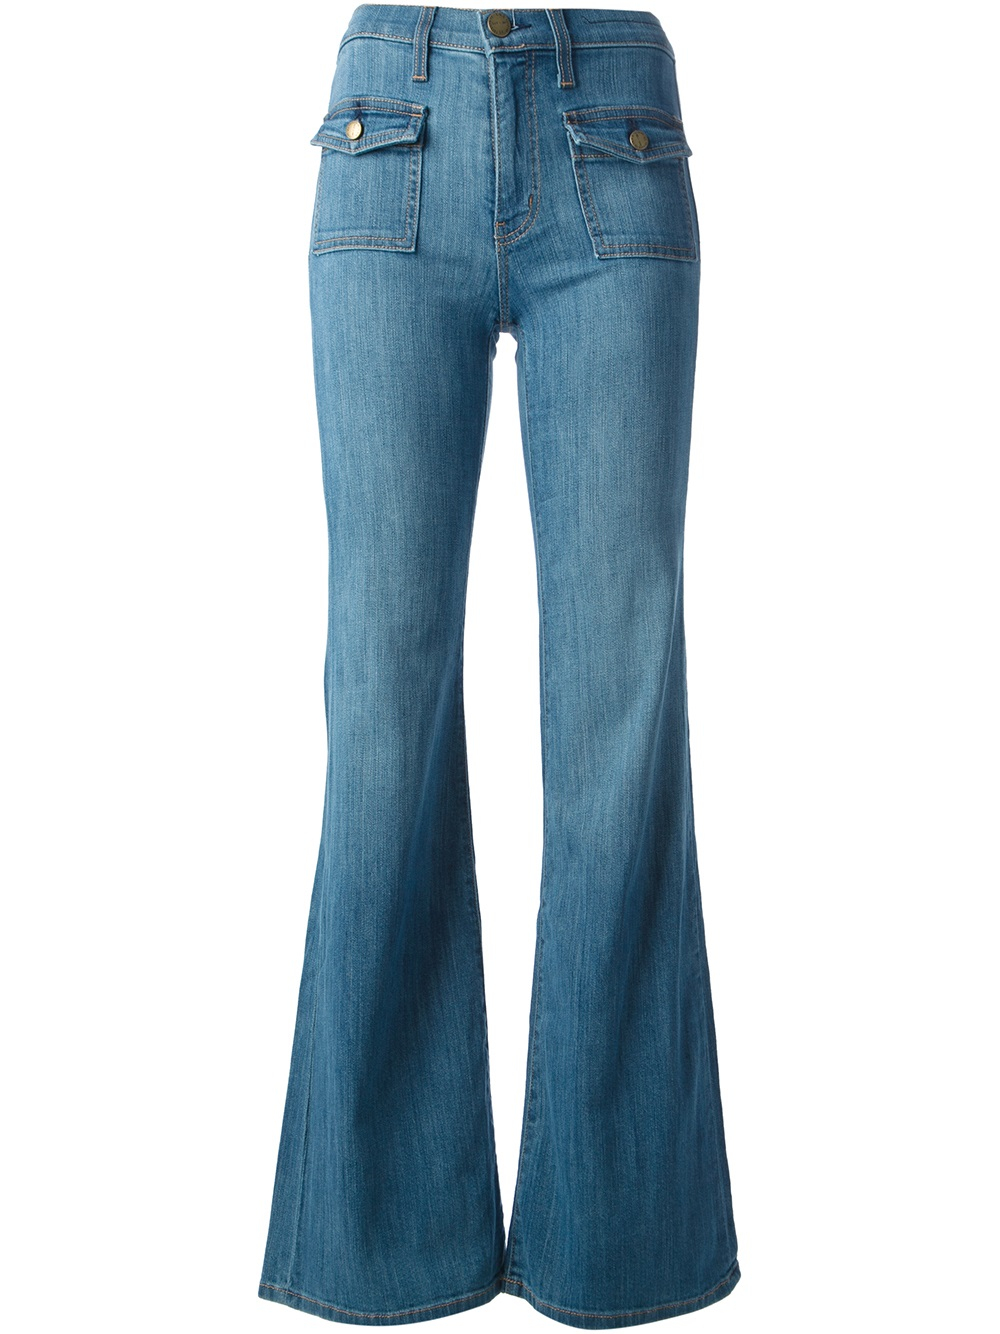 Womens Flare Leg Jeans